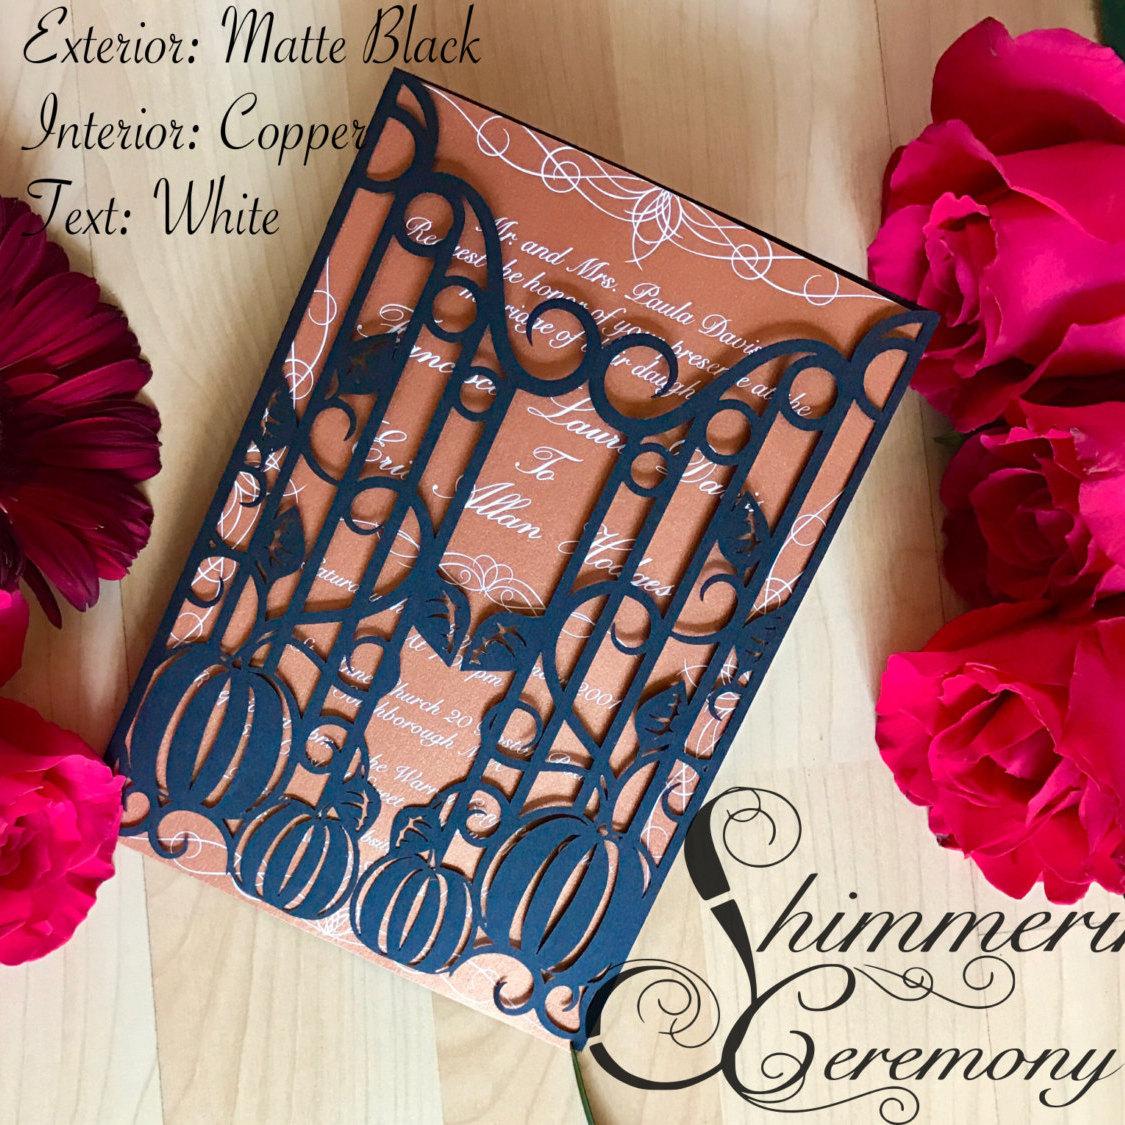 Pumpkin Iron Gate Invitation  Shimmering Ceremony